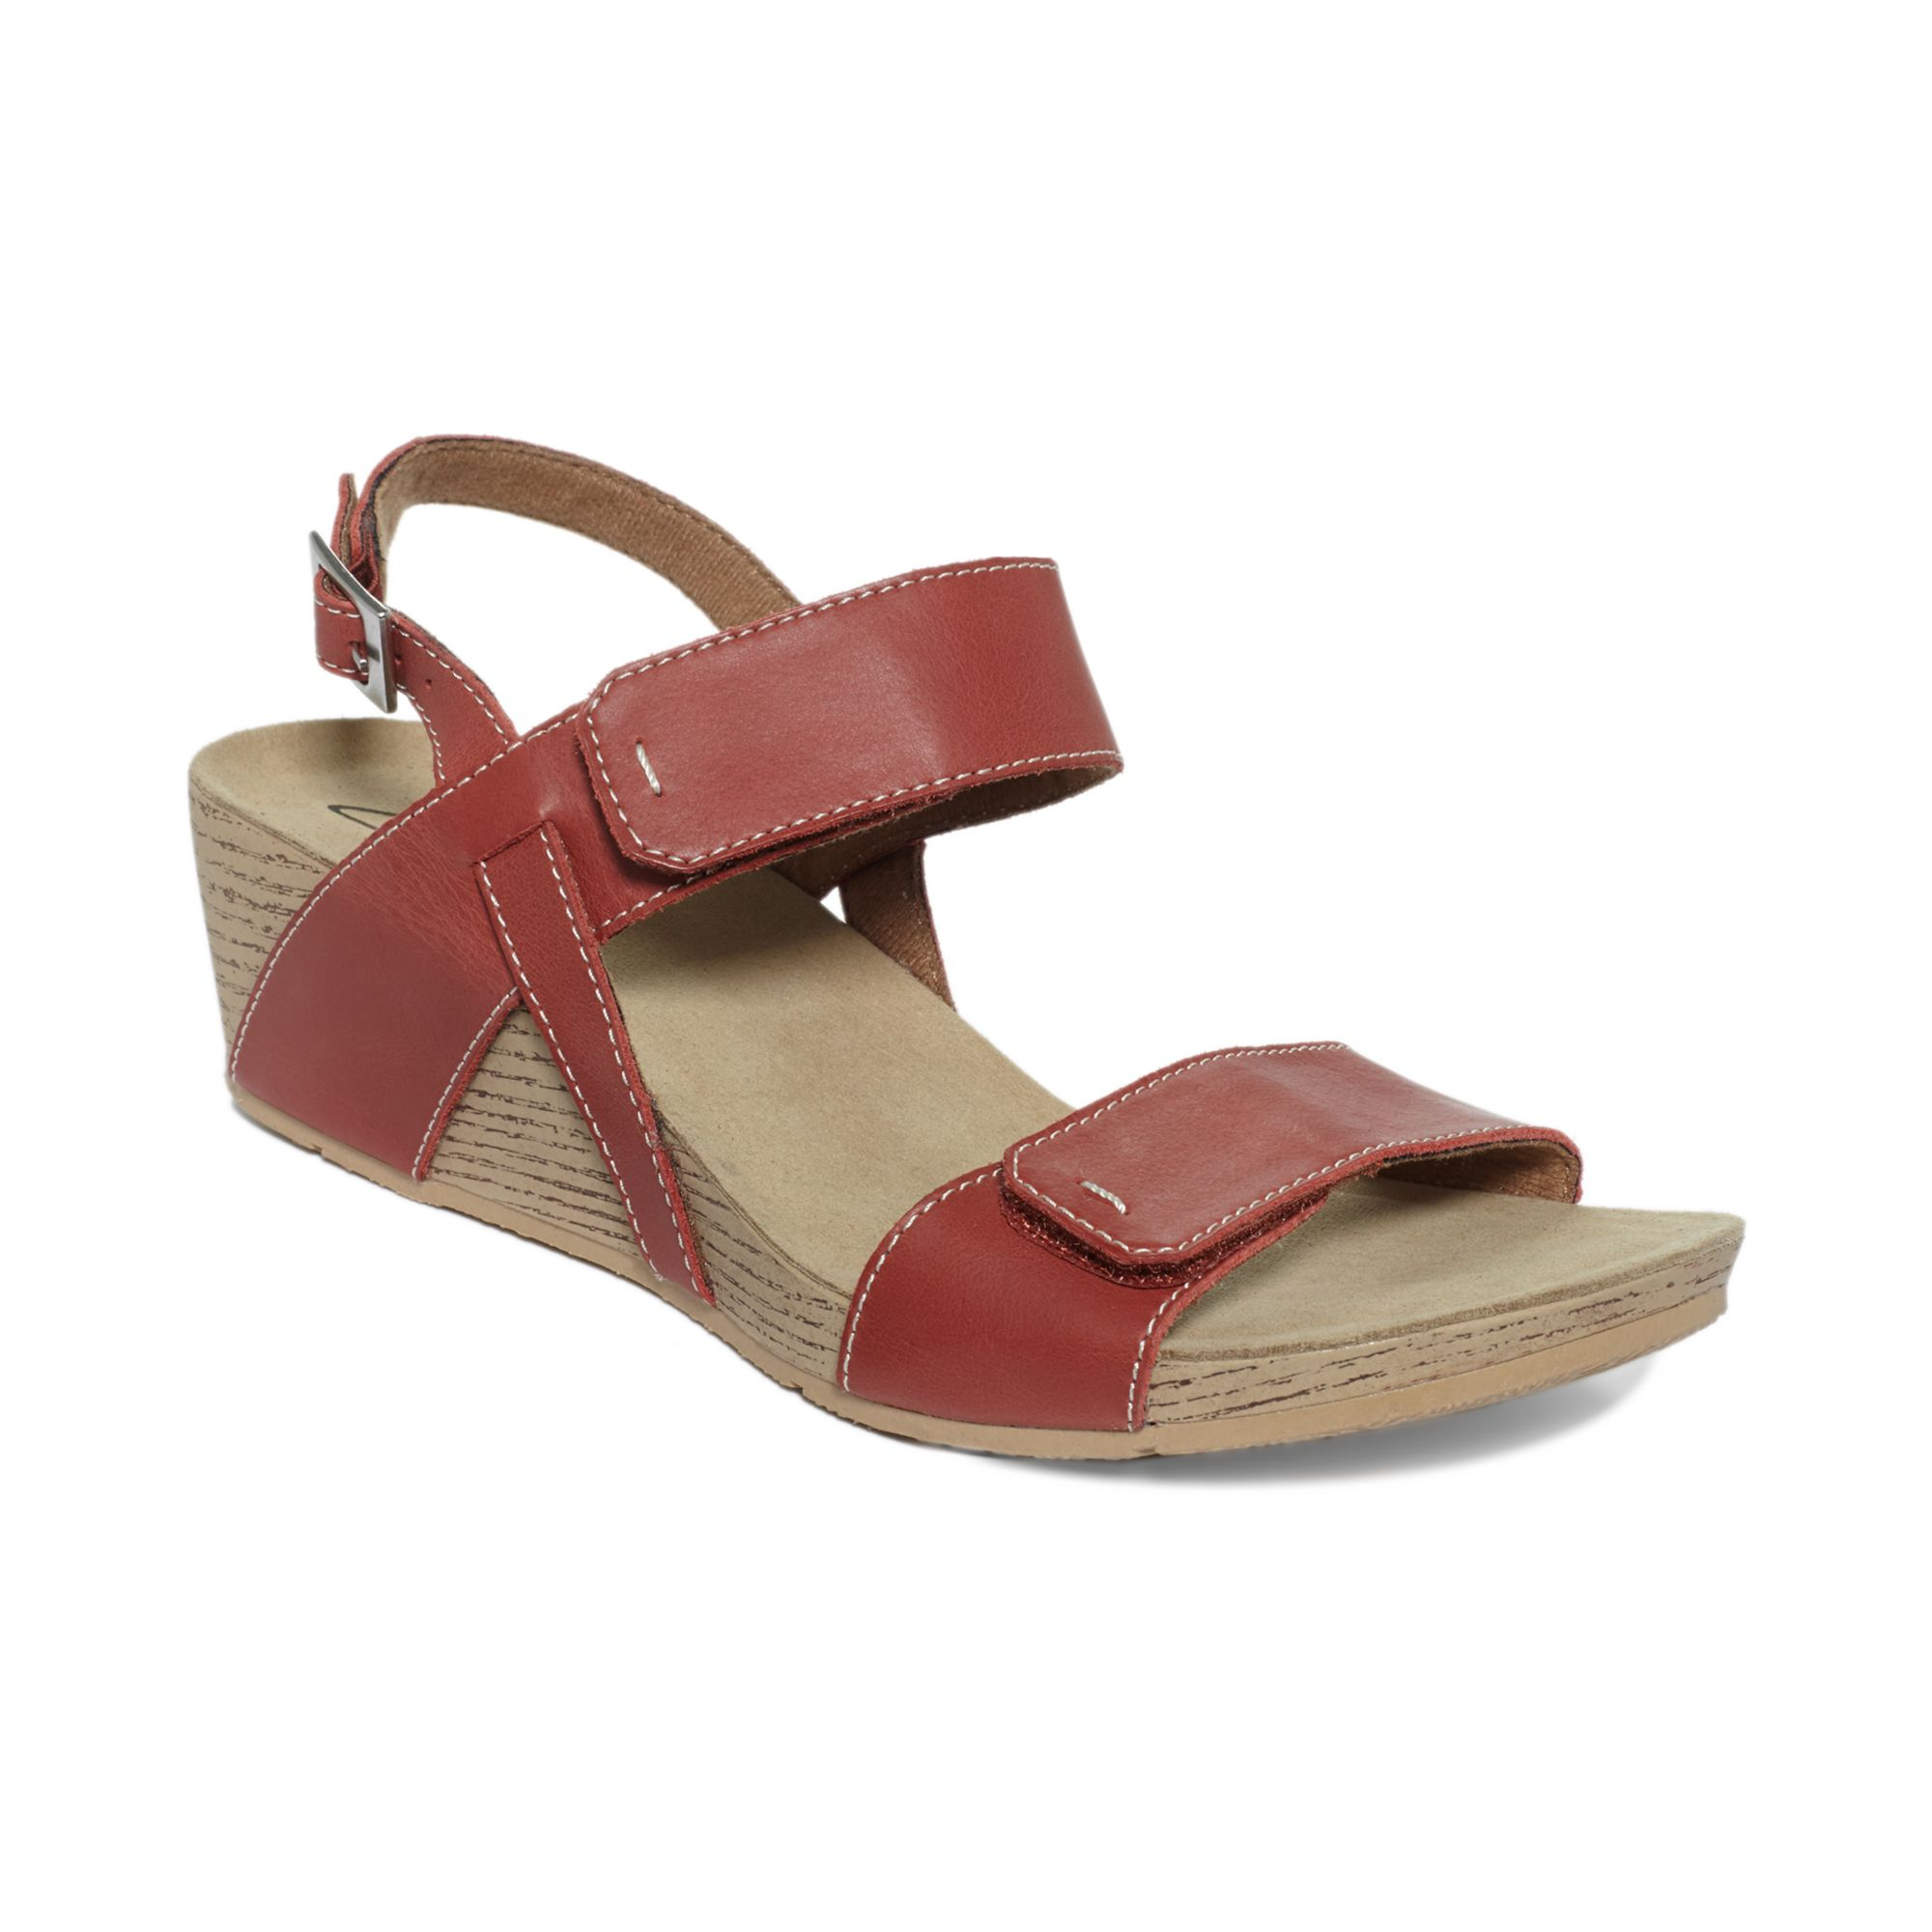 Lyst Clarks Alto Disco Platform Wedge Sandals In Red